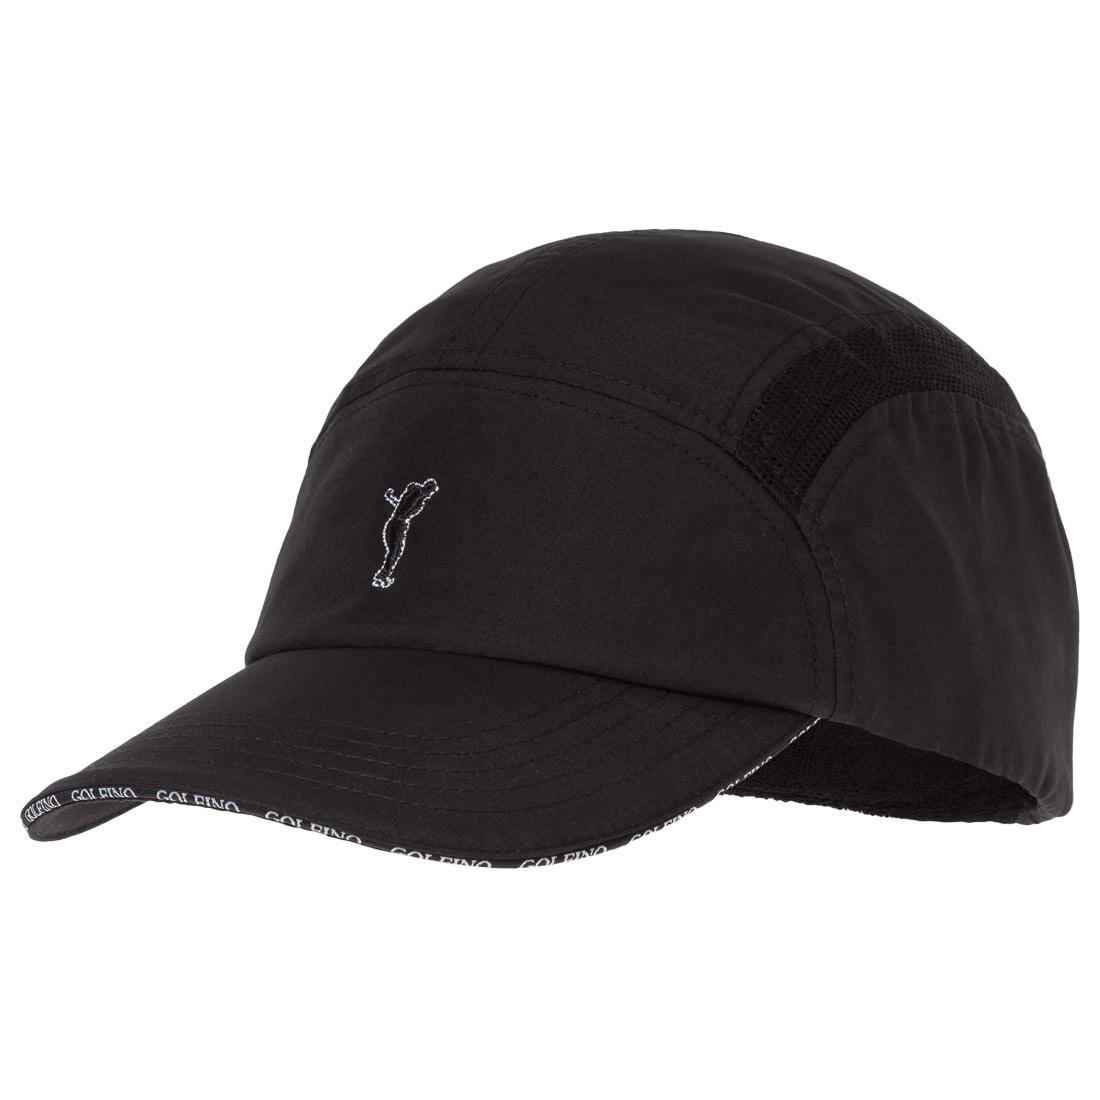 Herren Golfcap